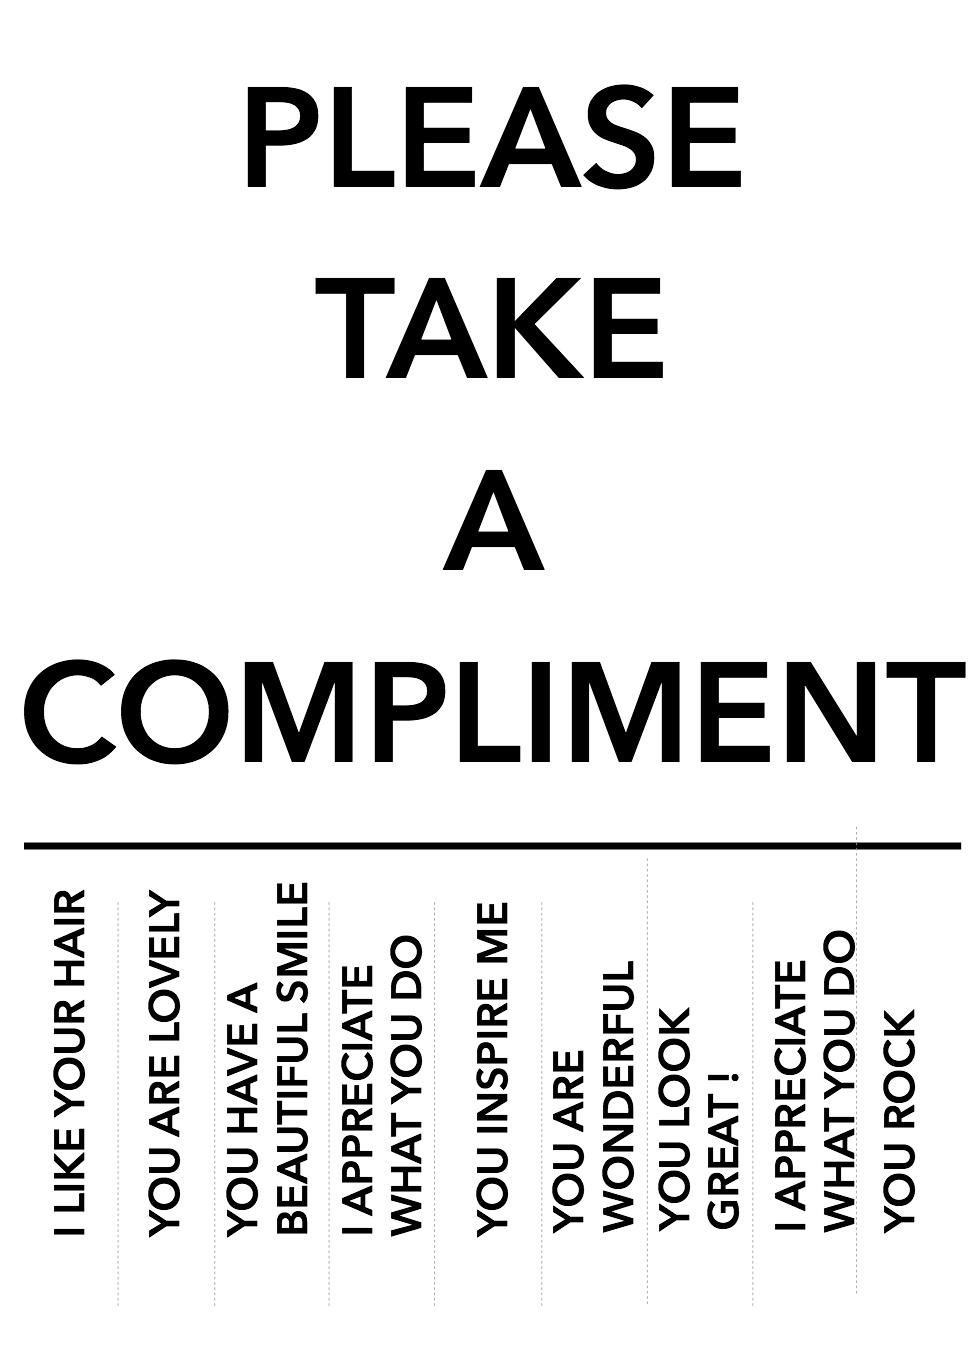 compliment1.jpg